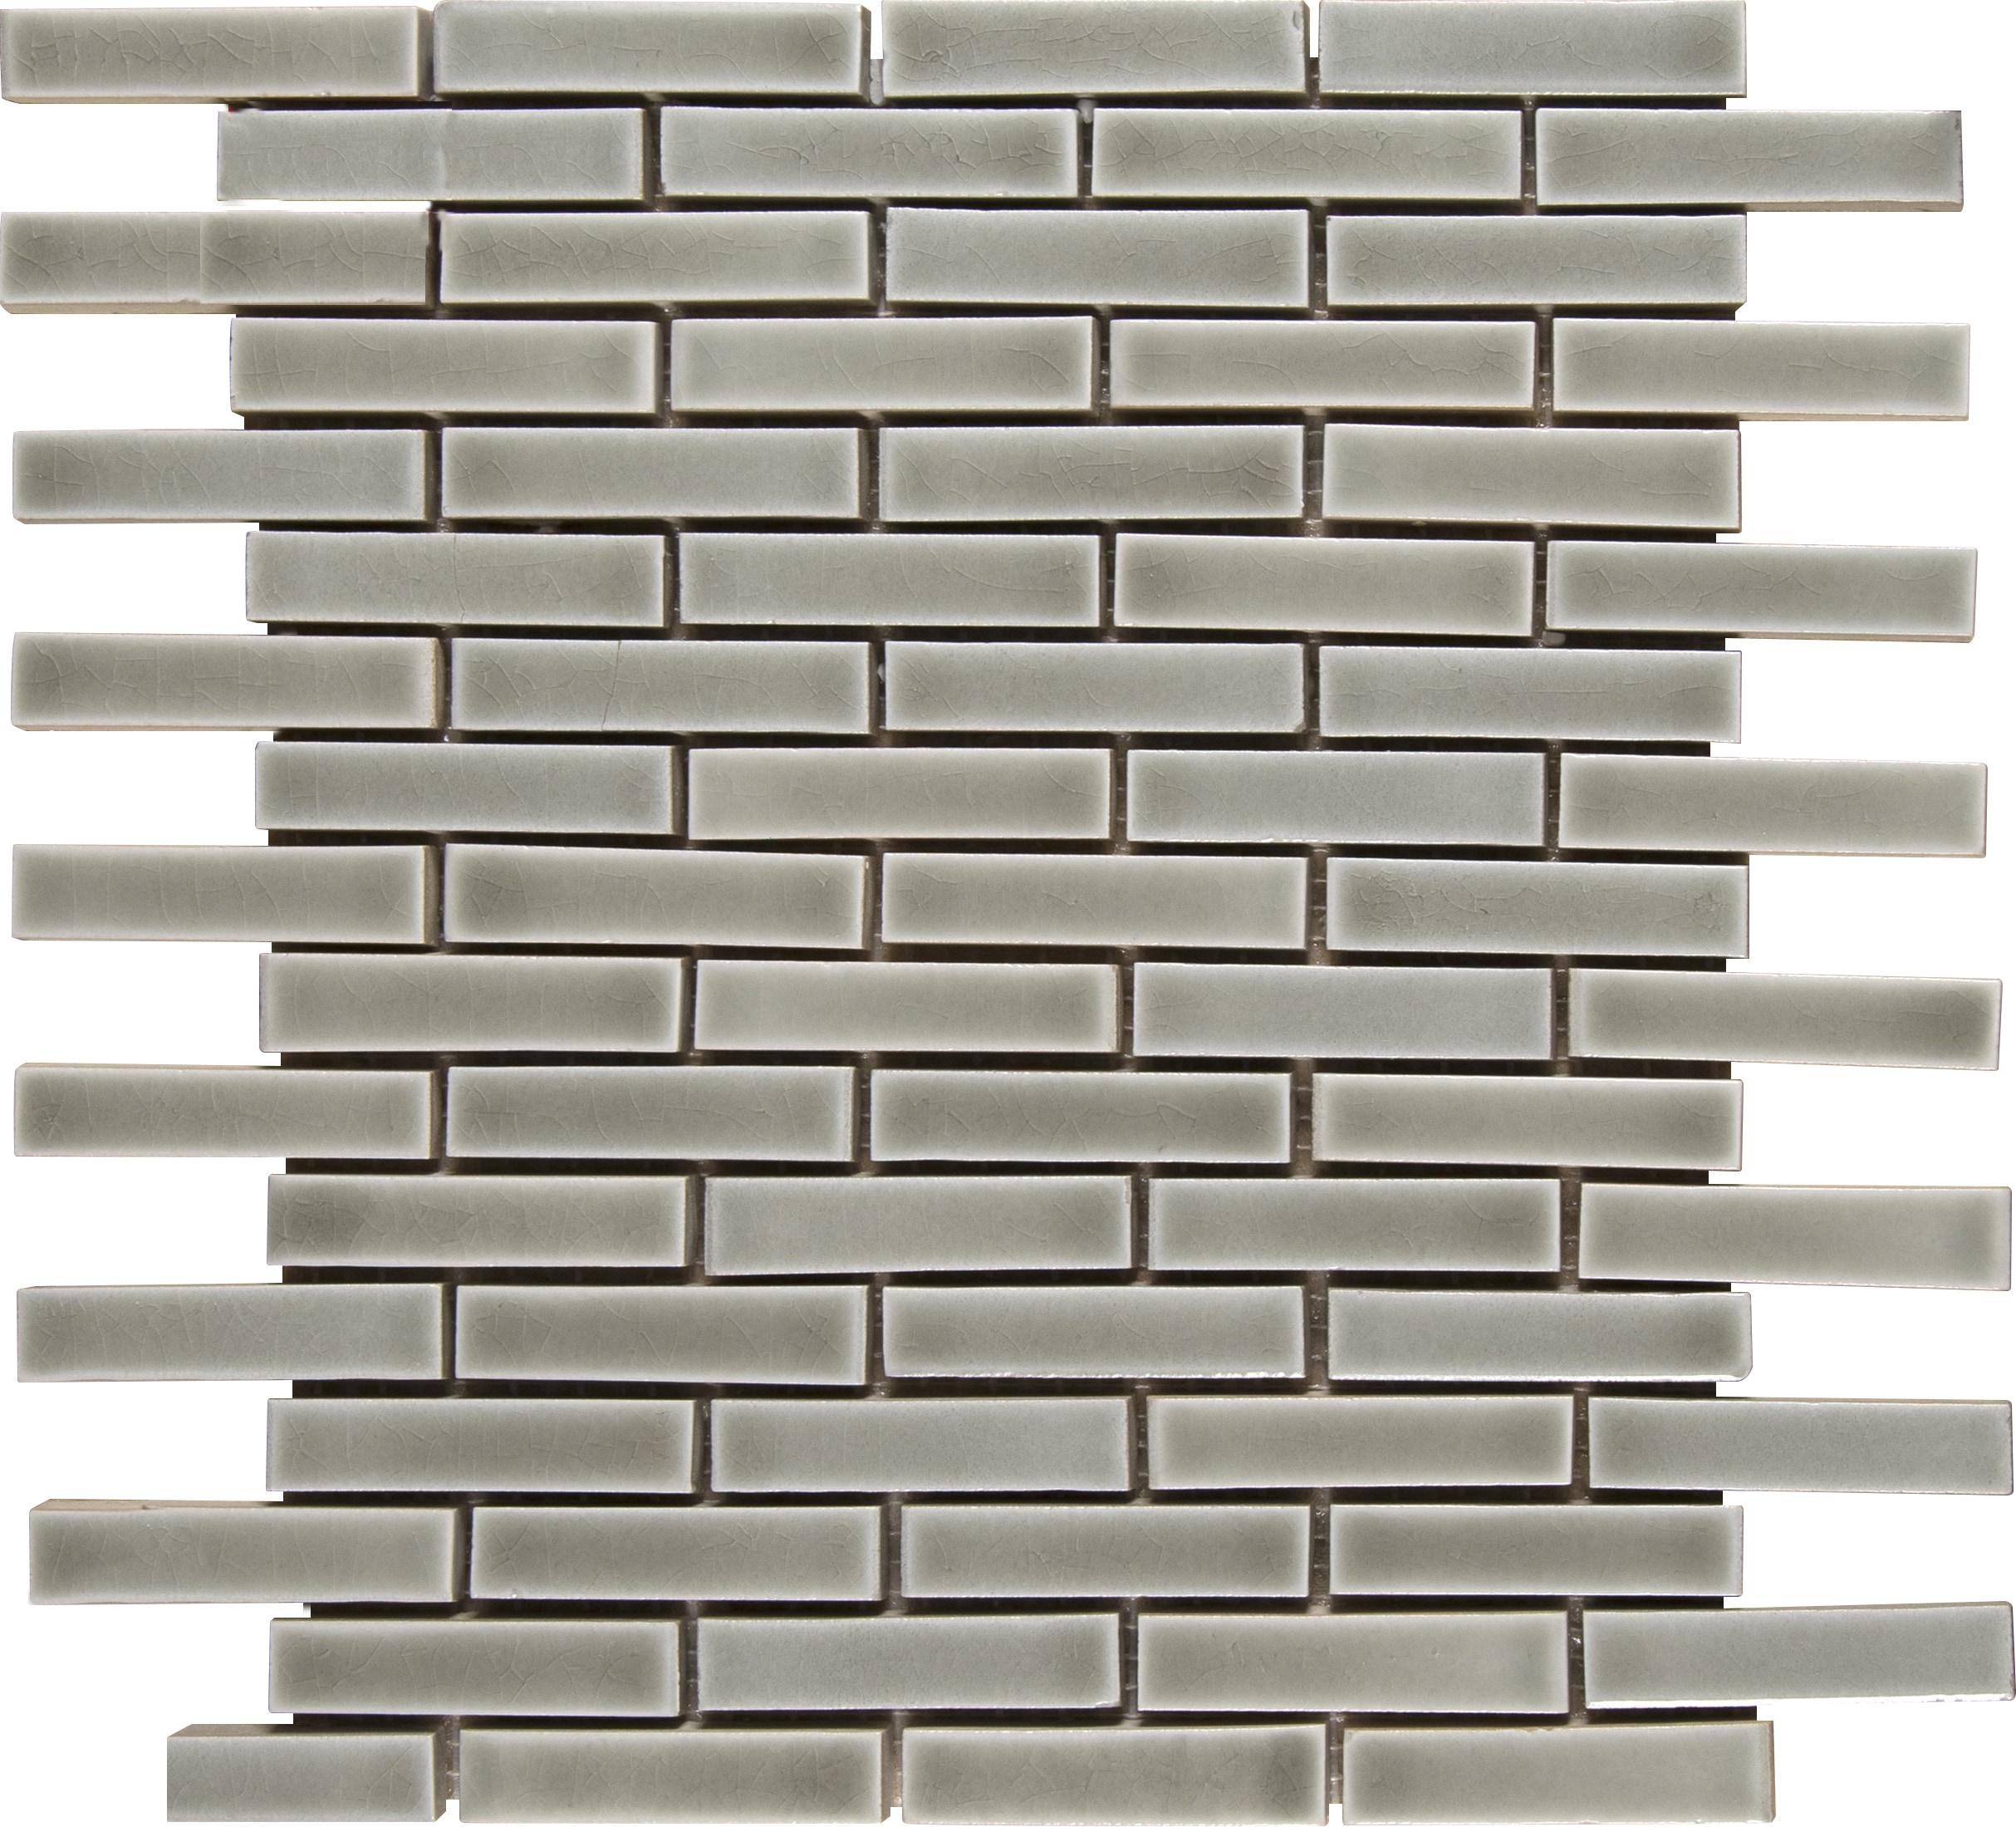 Brick 8mm / Pattern / Glossy Ceramic Tile - Dove Gray 0